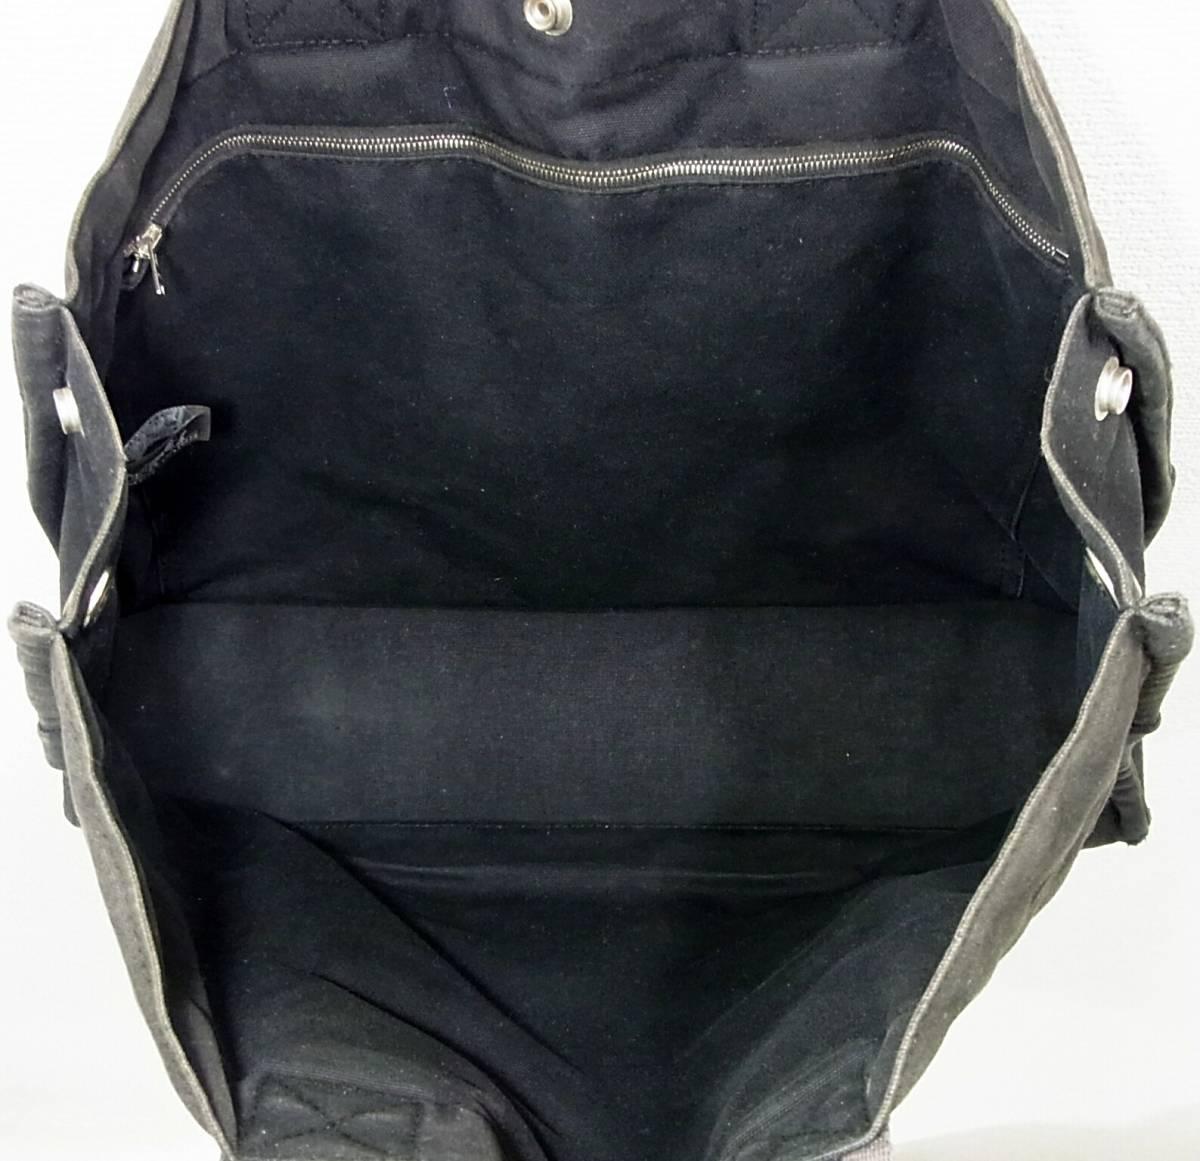 HERMES フールトゥMM 黒 キャンバストートバッグ ブラック×ダークグレー 2本ライン トートMM コットン手提げかばん ハンドバッグ エルメス_画像4